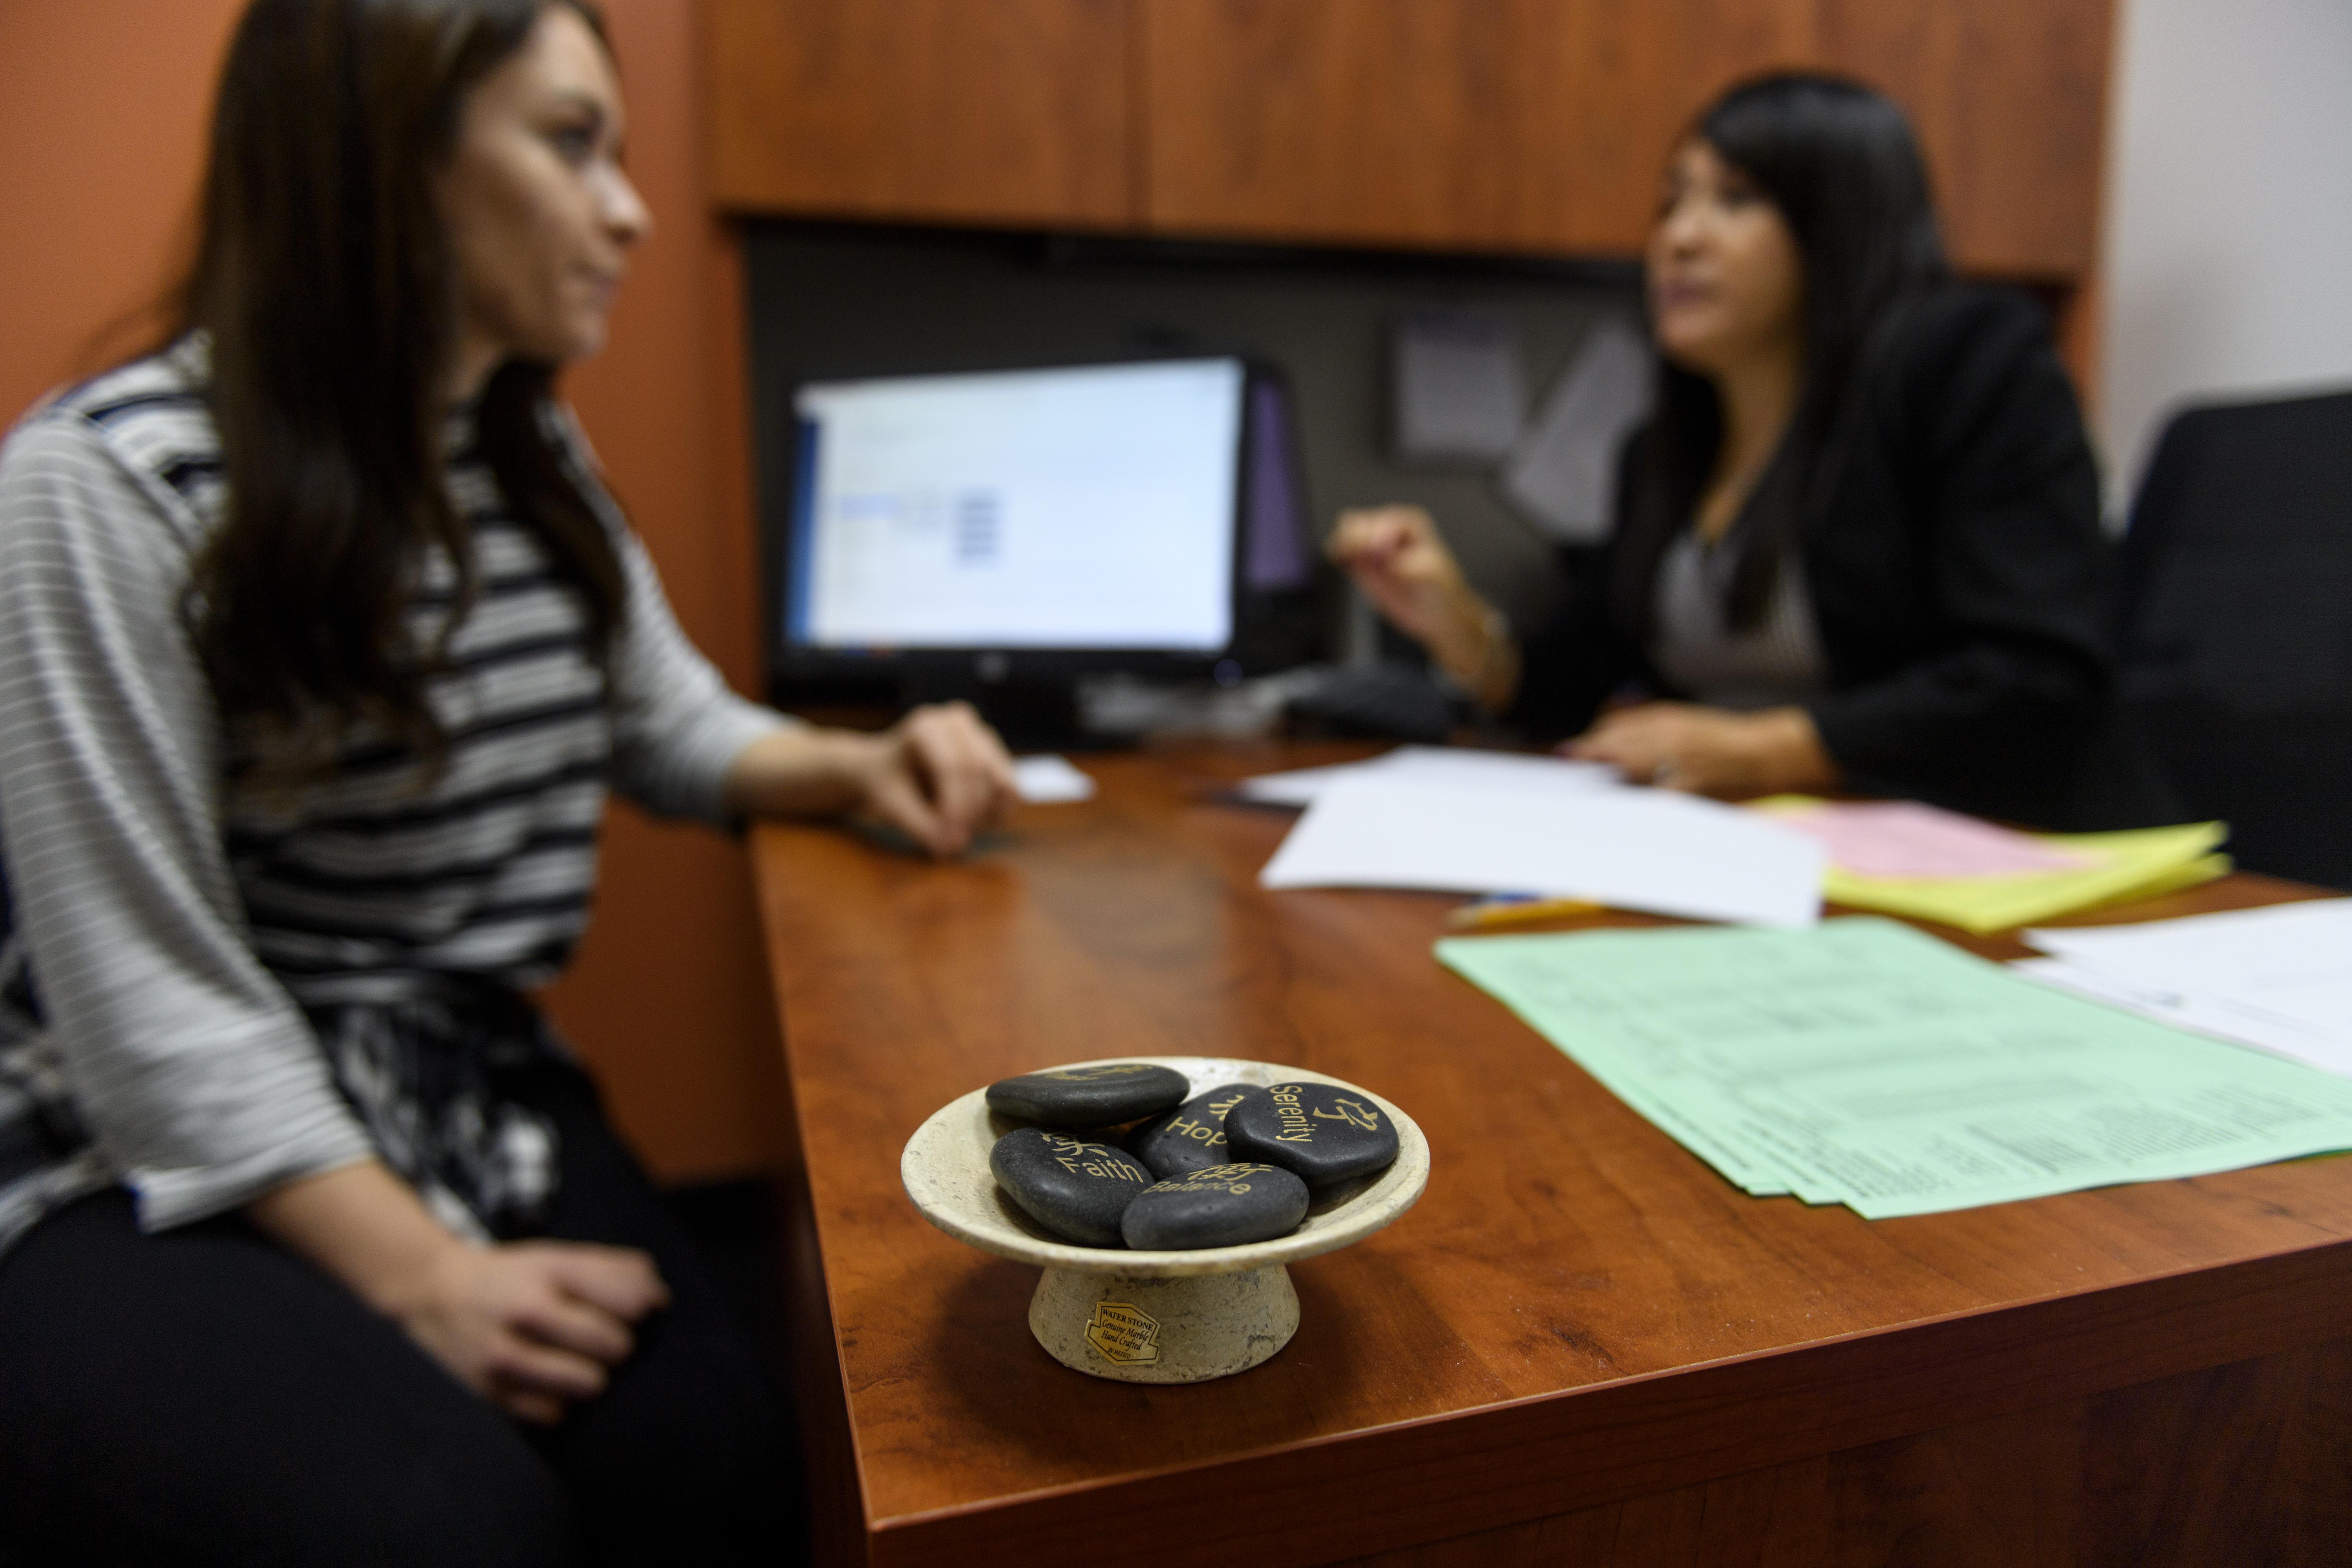 how to manage mental health in college jjc joliet junior college get help counselor friend professor